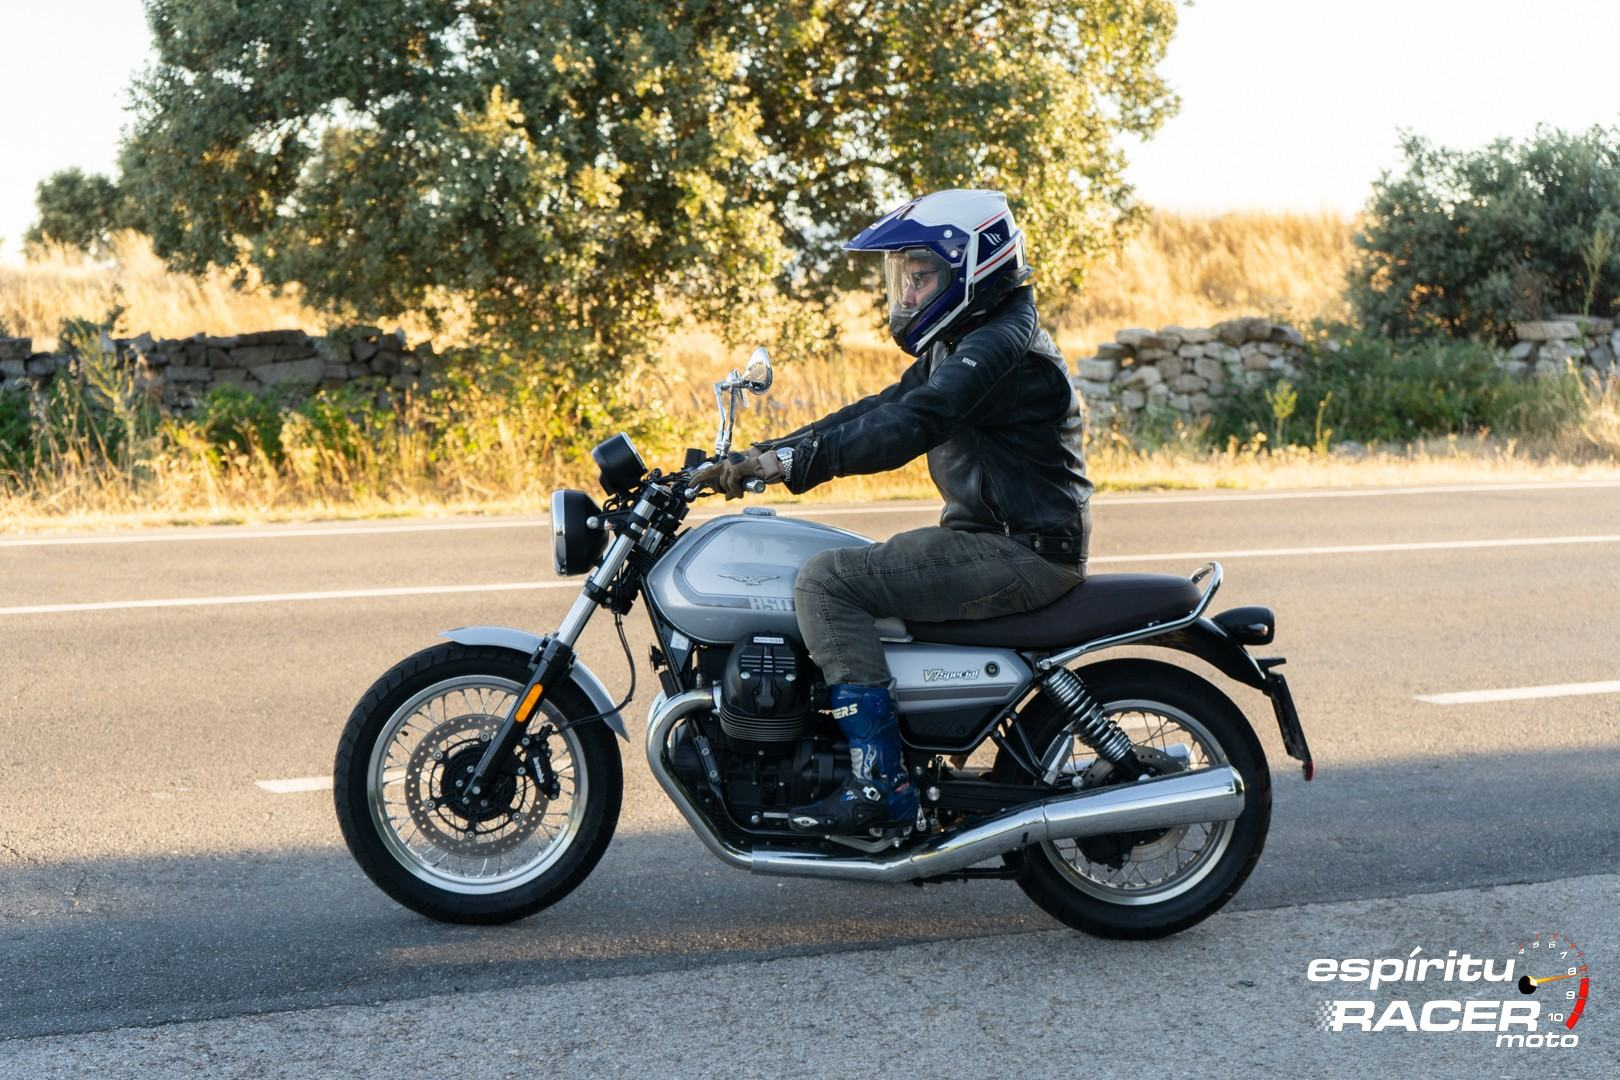 Moto Guzzi V7 850 Special 69